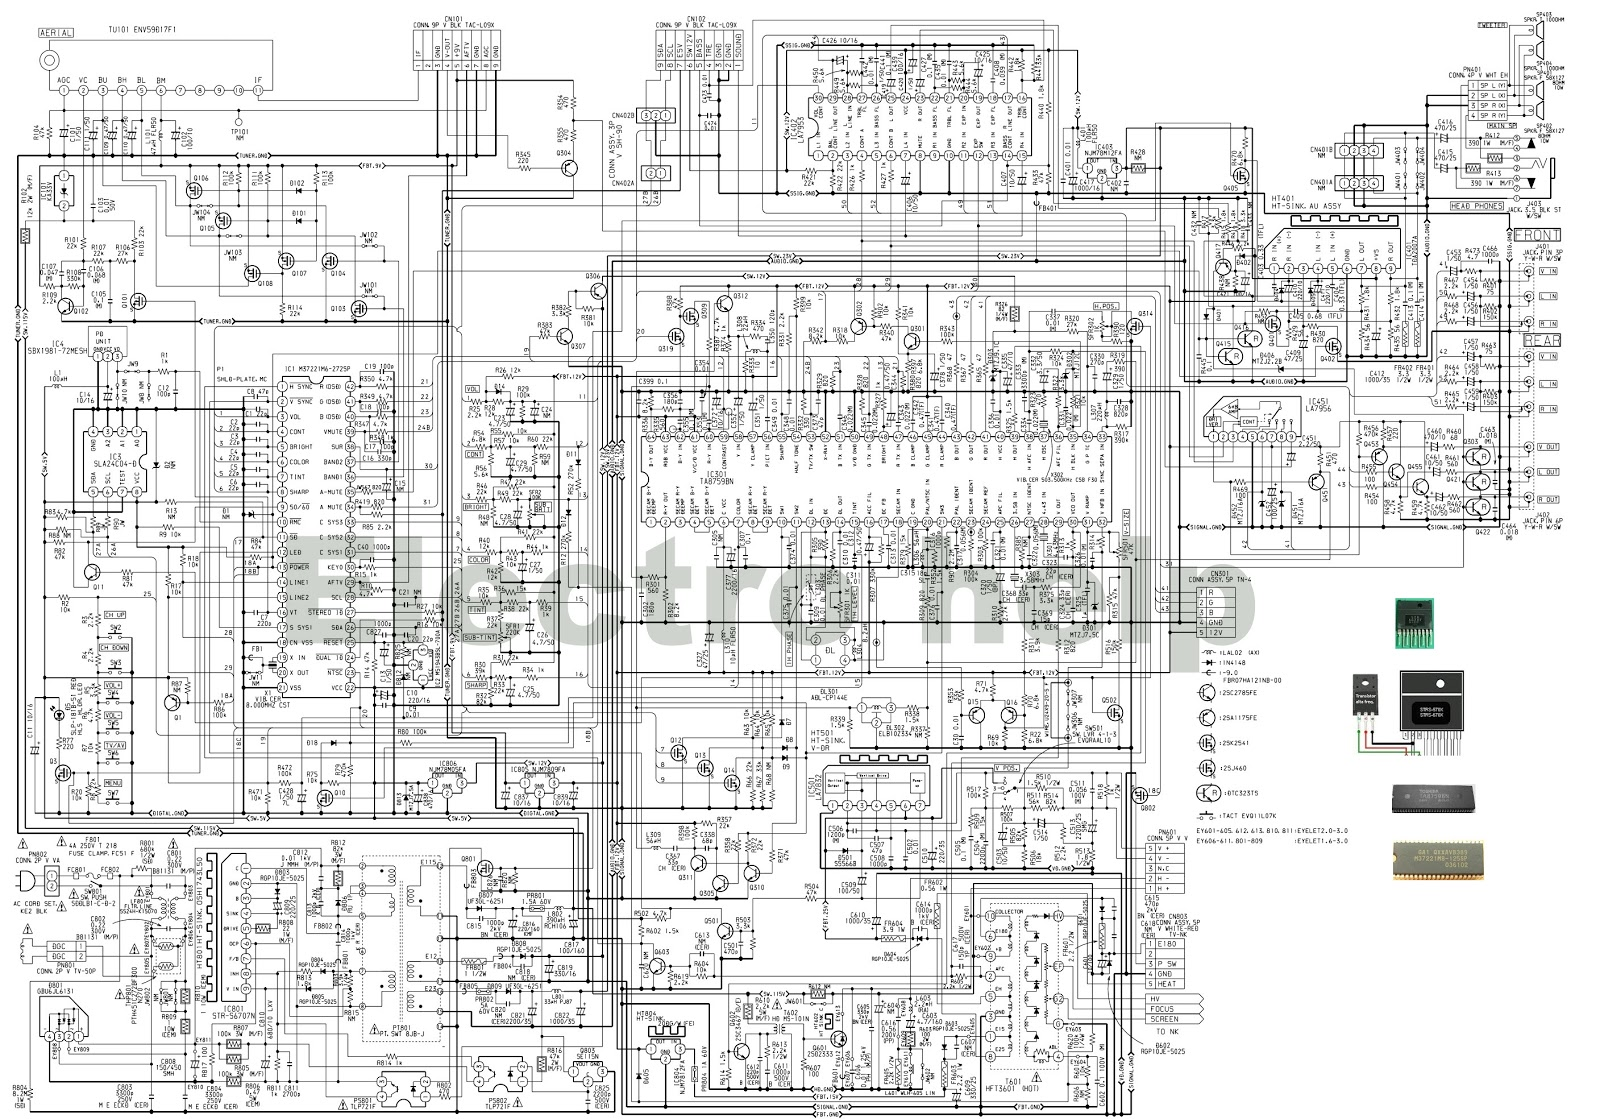 Aiwa Tv A219 A209 A149 Circuit Diagram Electro Help Stereo Wiring Harness Main Board